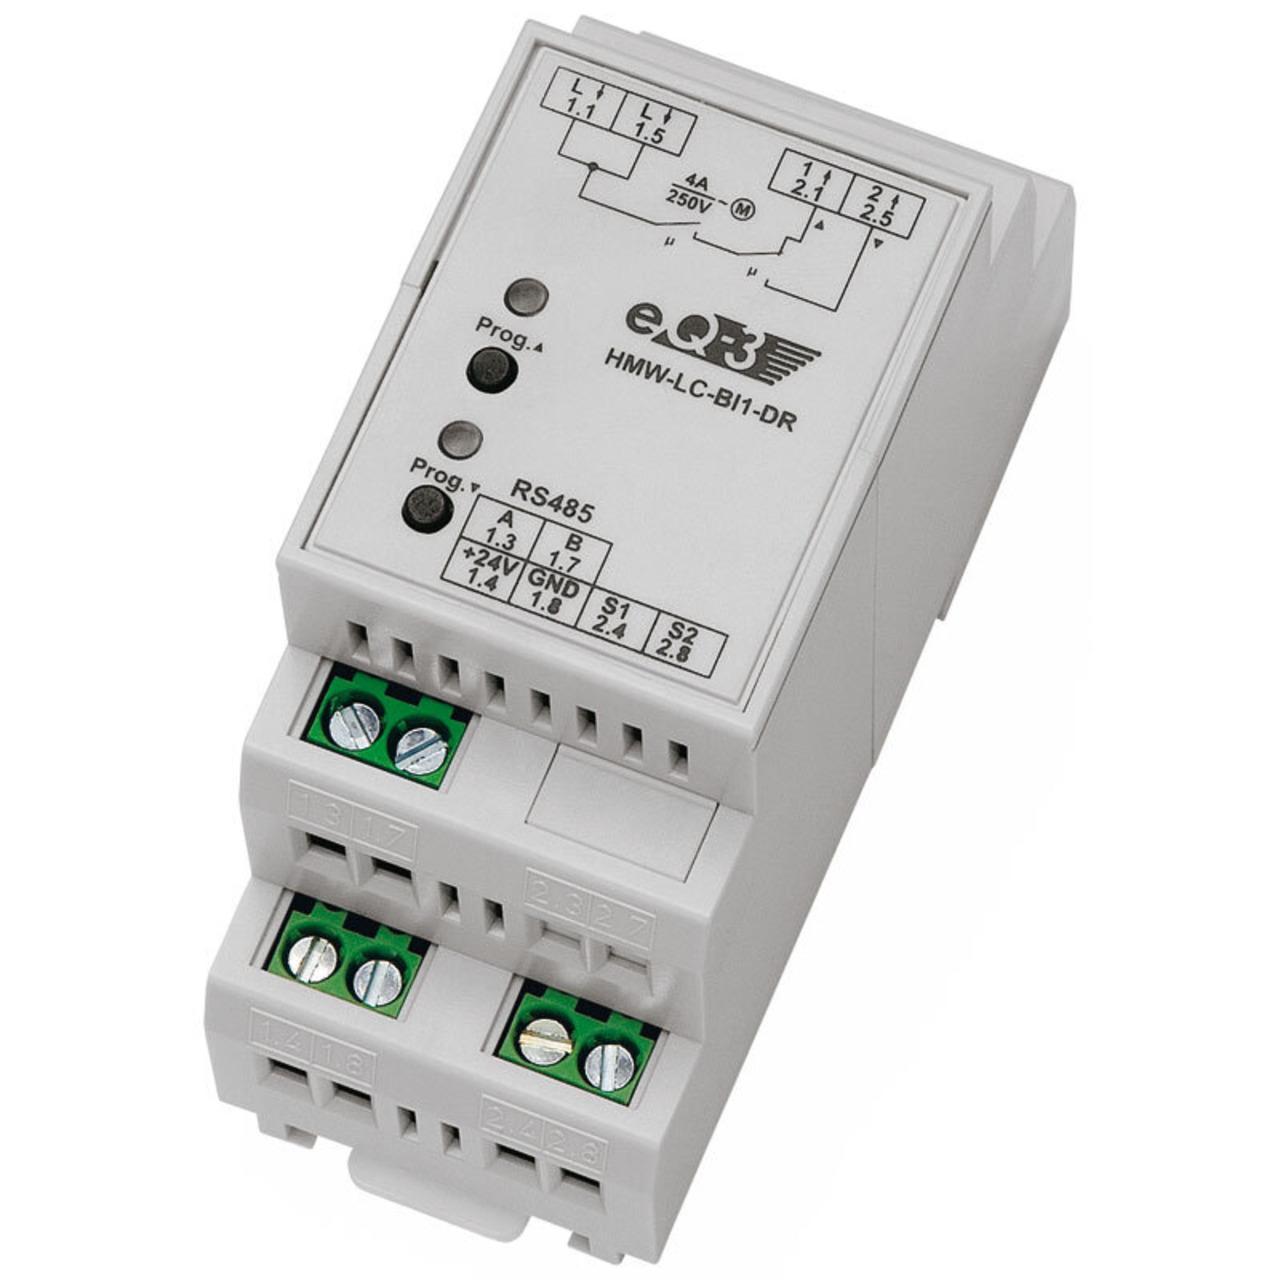 Homematic Wired RS485-Rollladenaktor, 1fach HMW-LC-Bl1-DR für Smart Home / Hausautomation